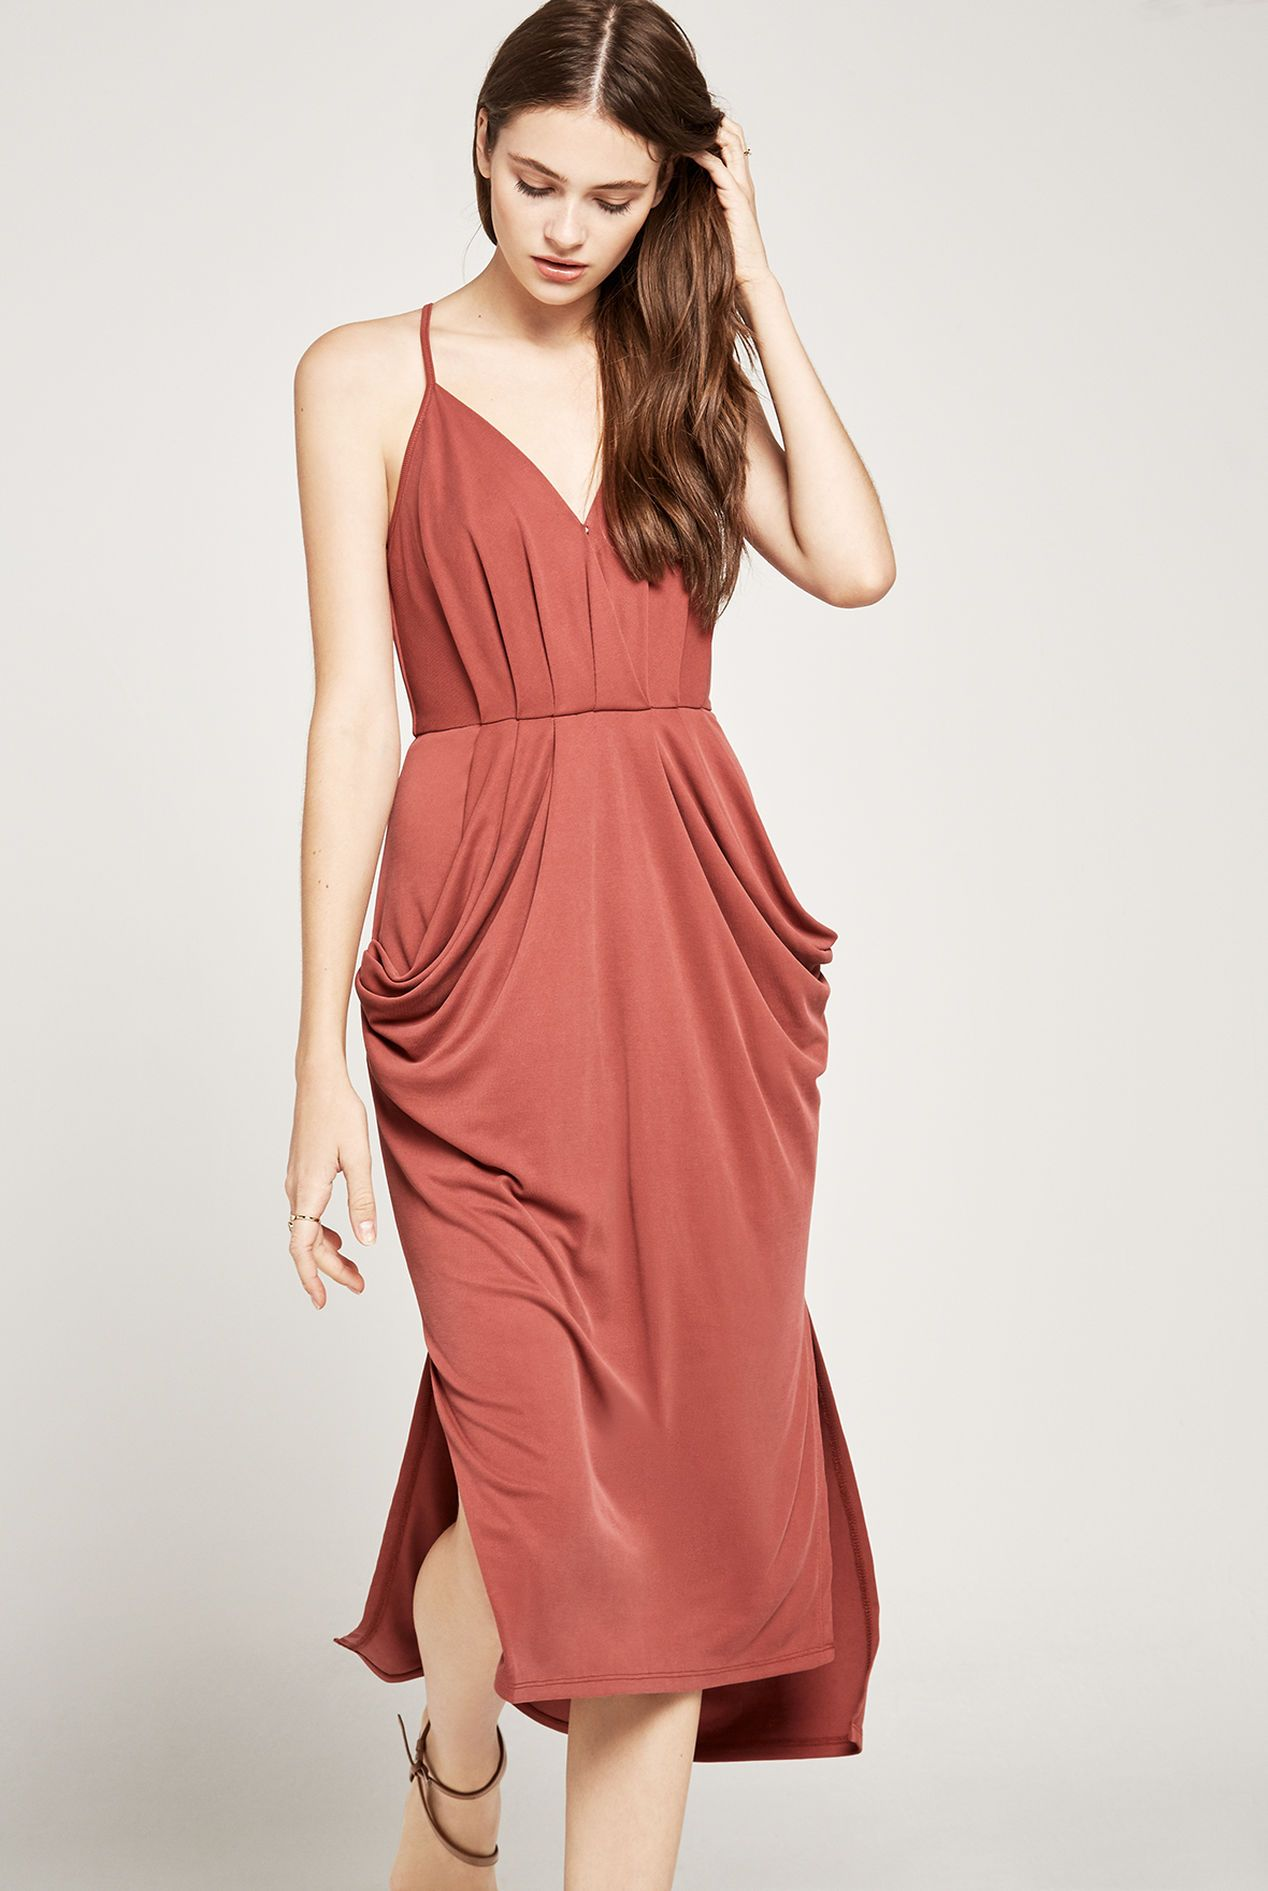 Sleeveless Surplice Midi Dress Ruby Wine 54 60 Dresses Midi Dress Sleeveless Midi Dress [ 1891 x 1268 Pixel ]